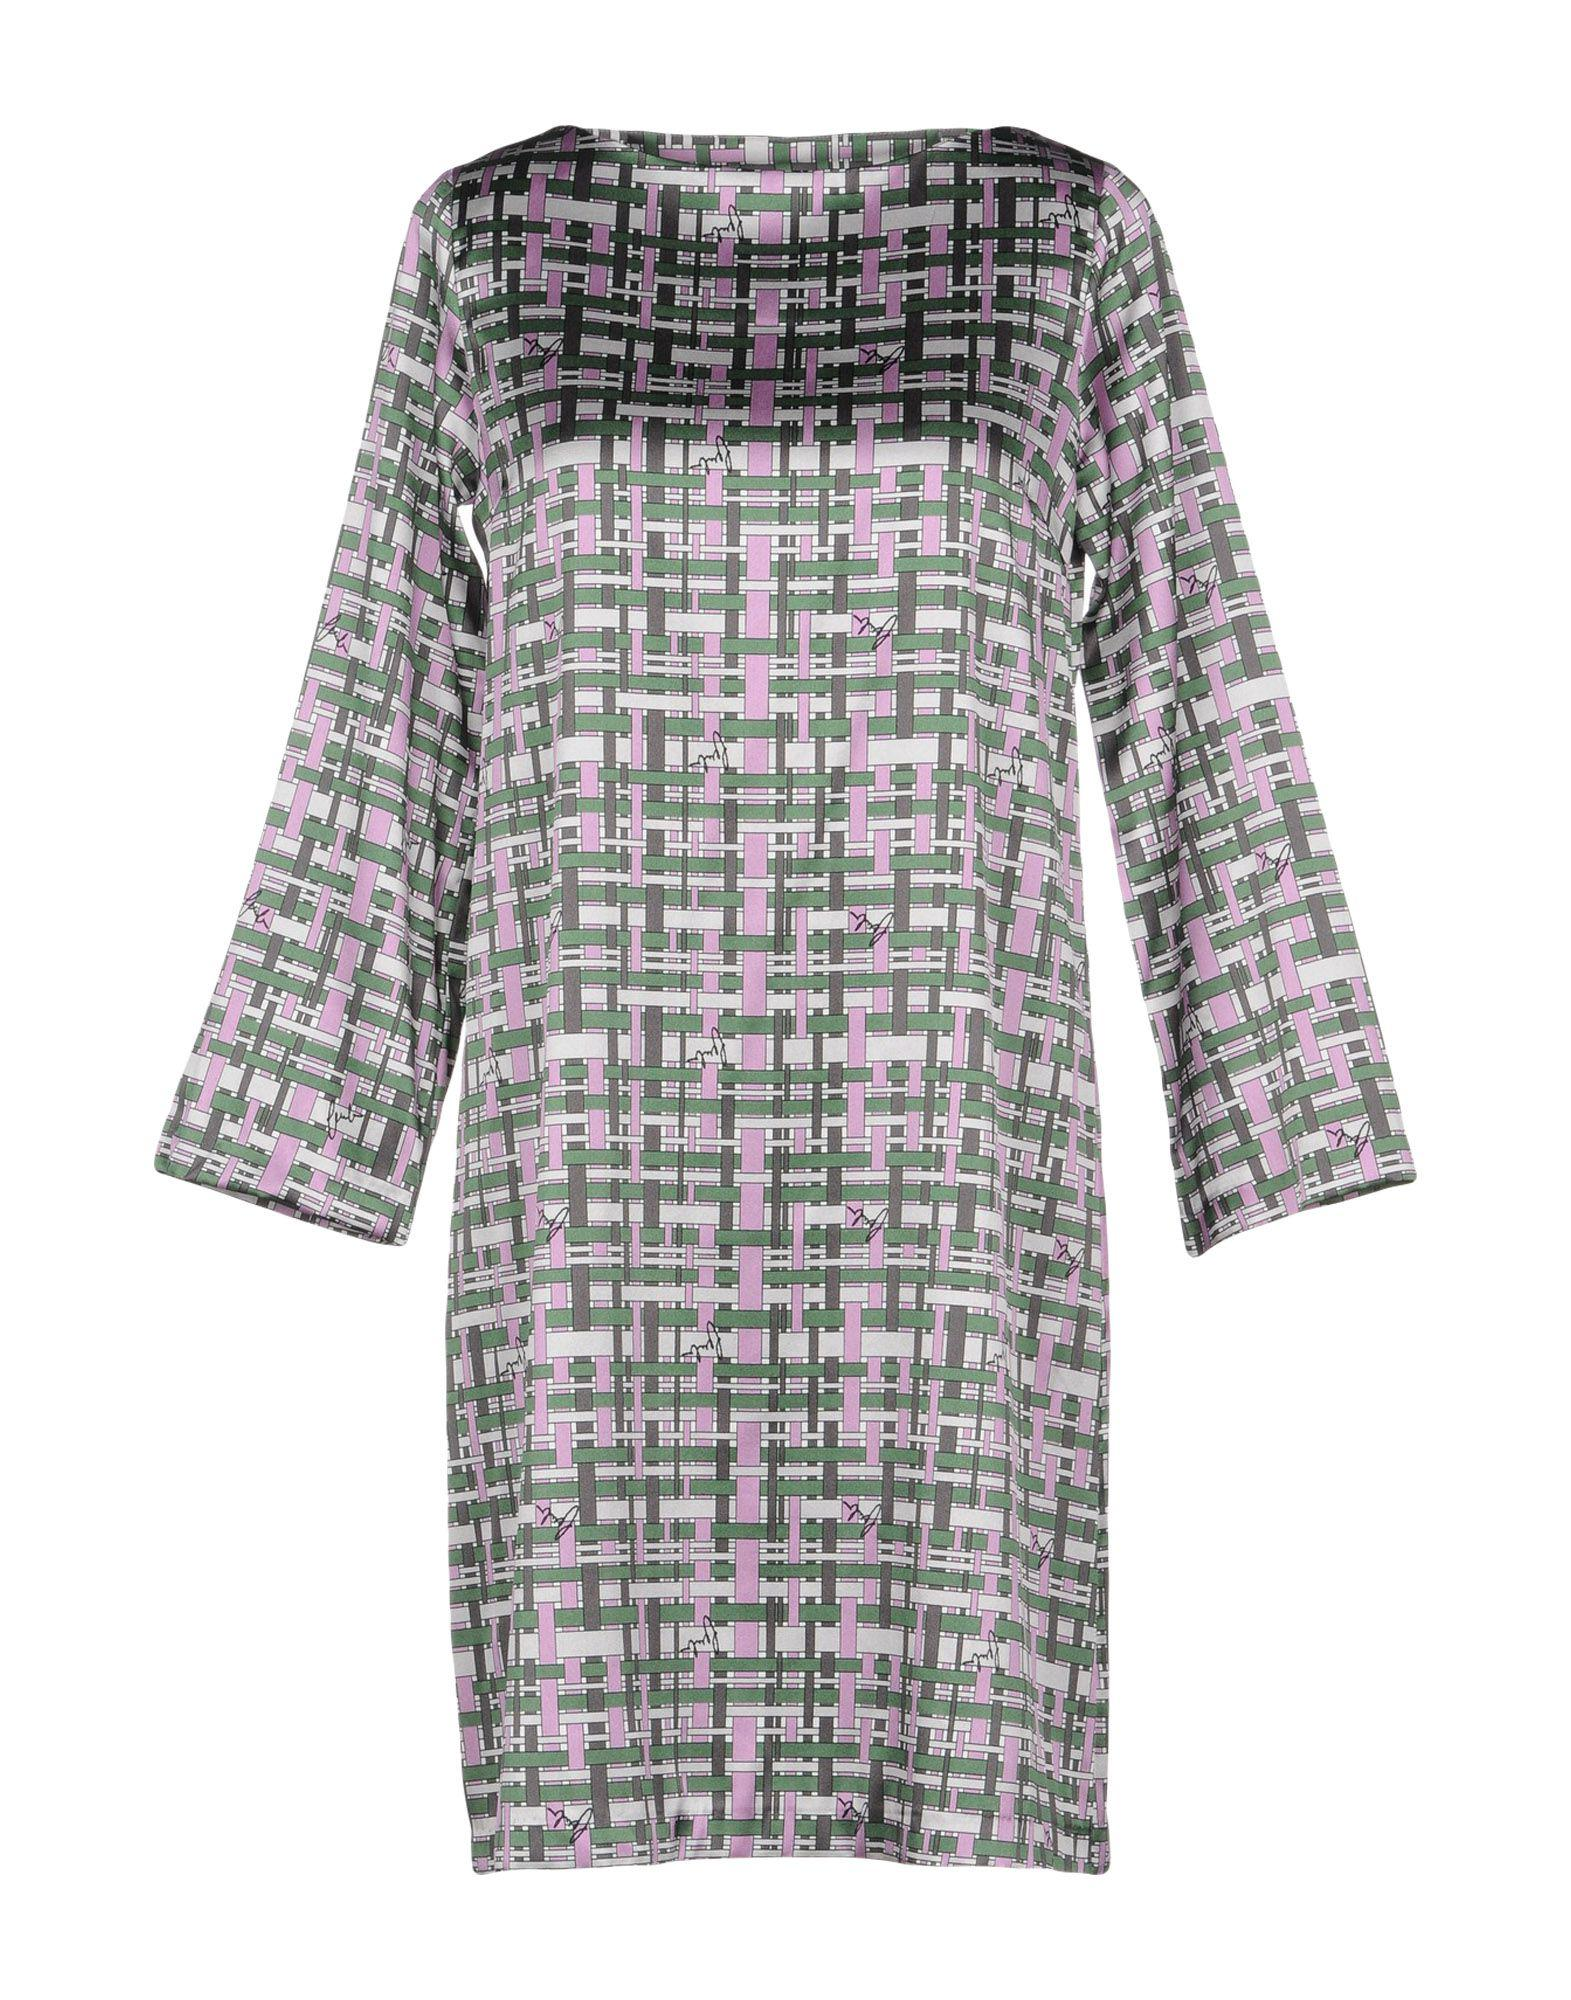 455daaa08e5 Bini Como Short Dress in Purple - Lyst